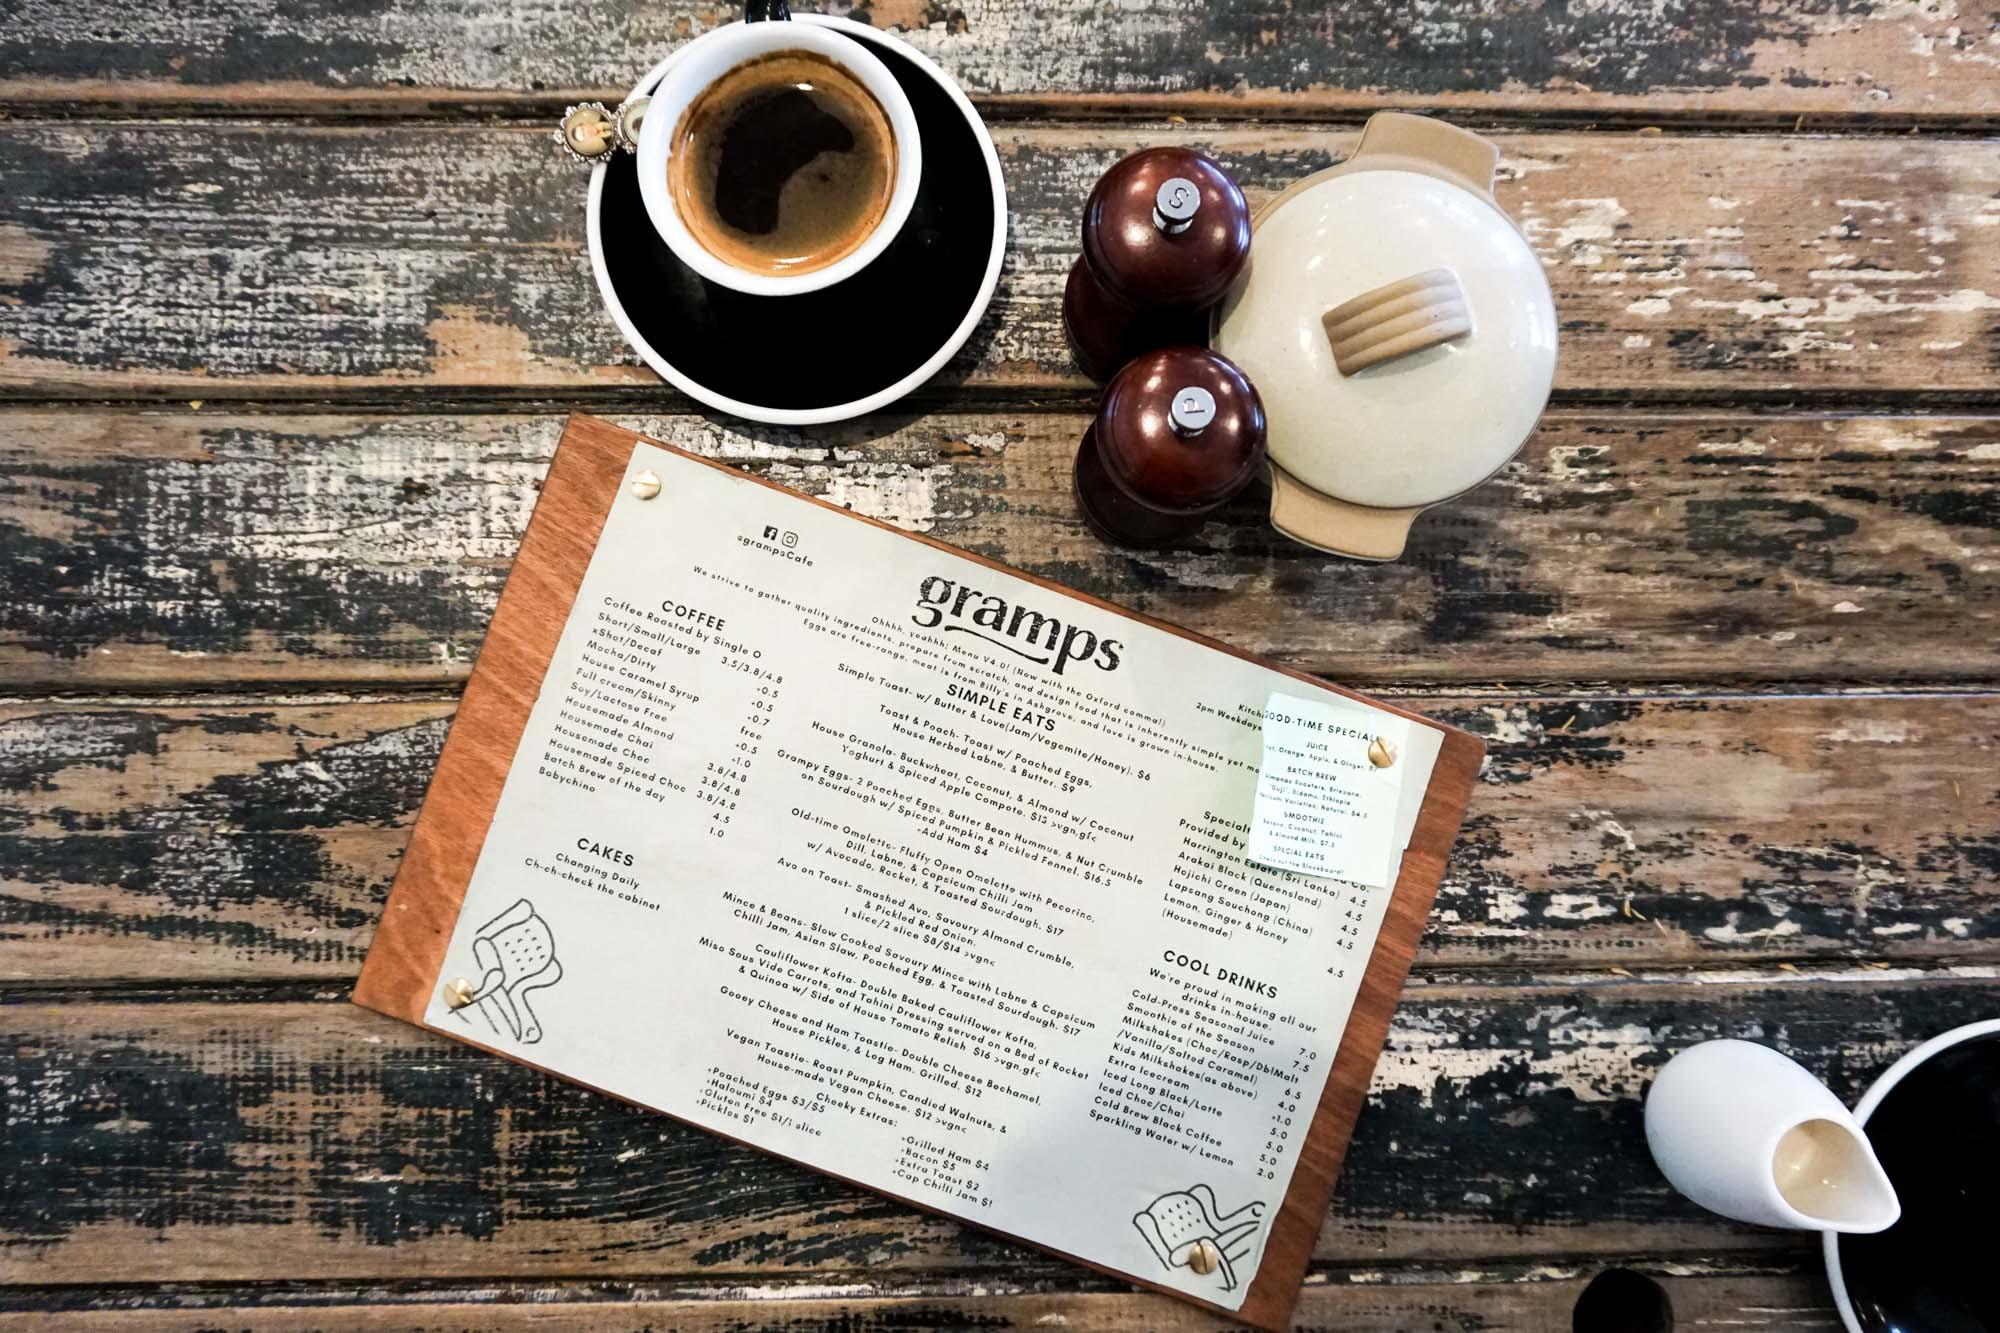 Gramps-Cafe-Indulge-Magazine-1-of-9.jpg